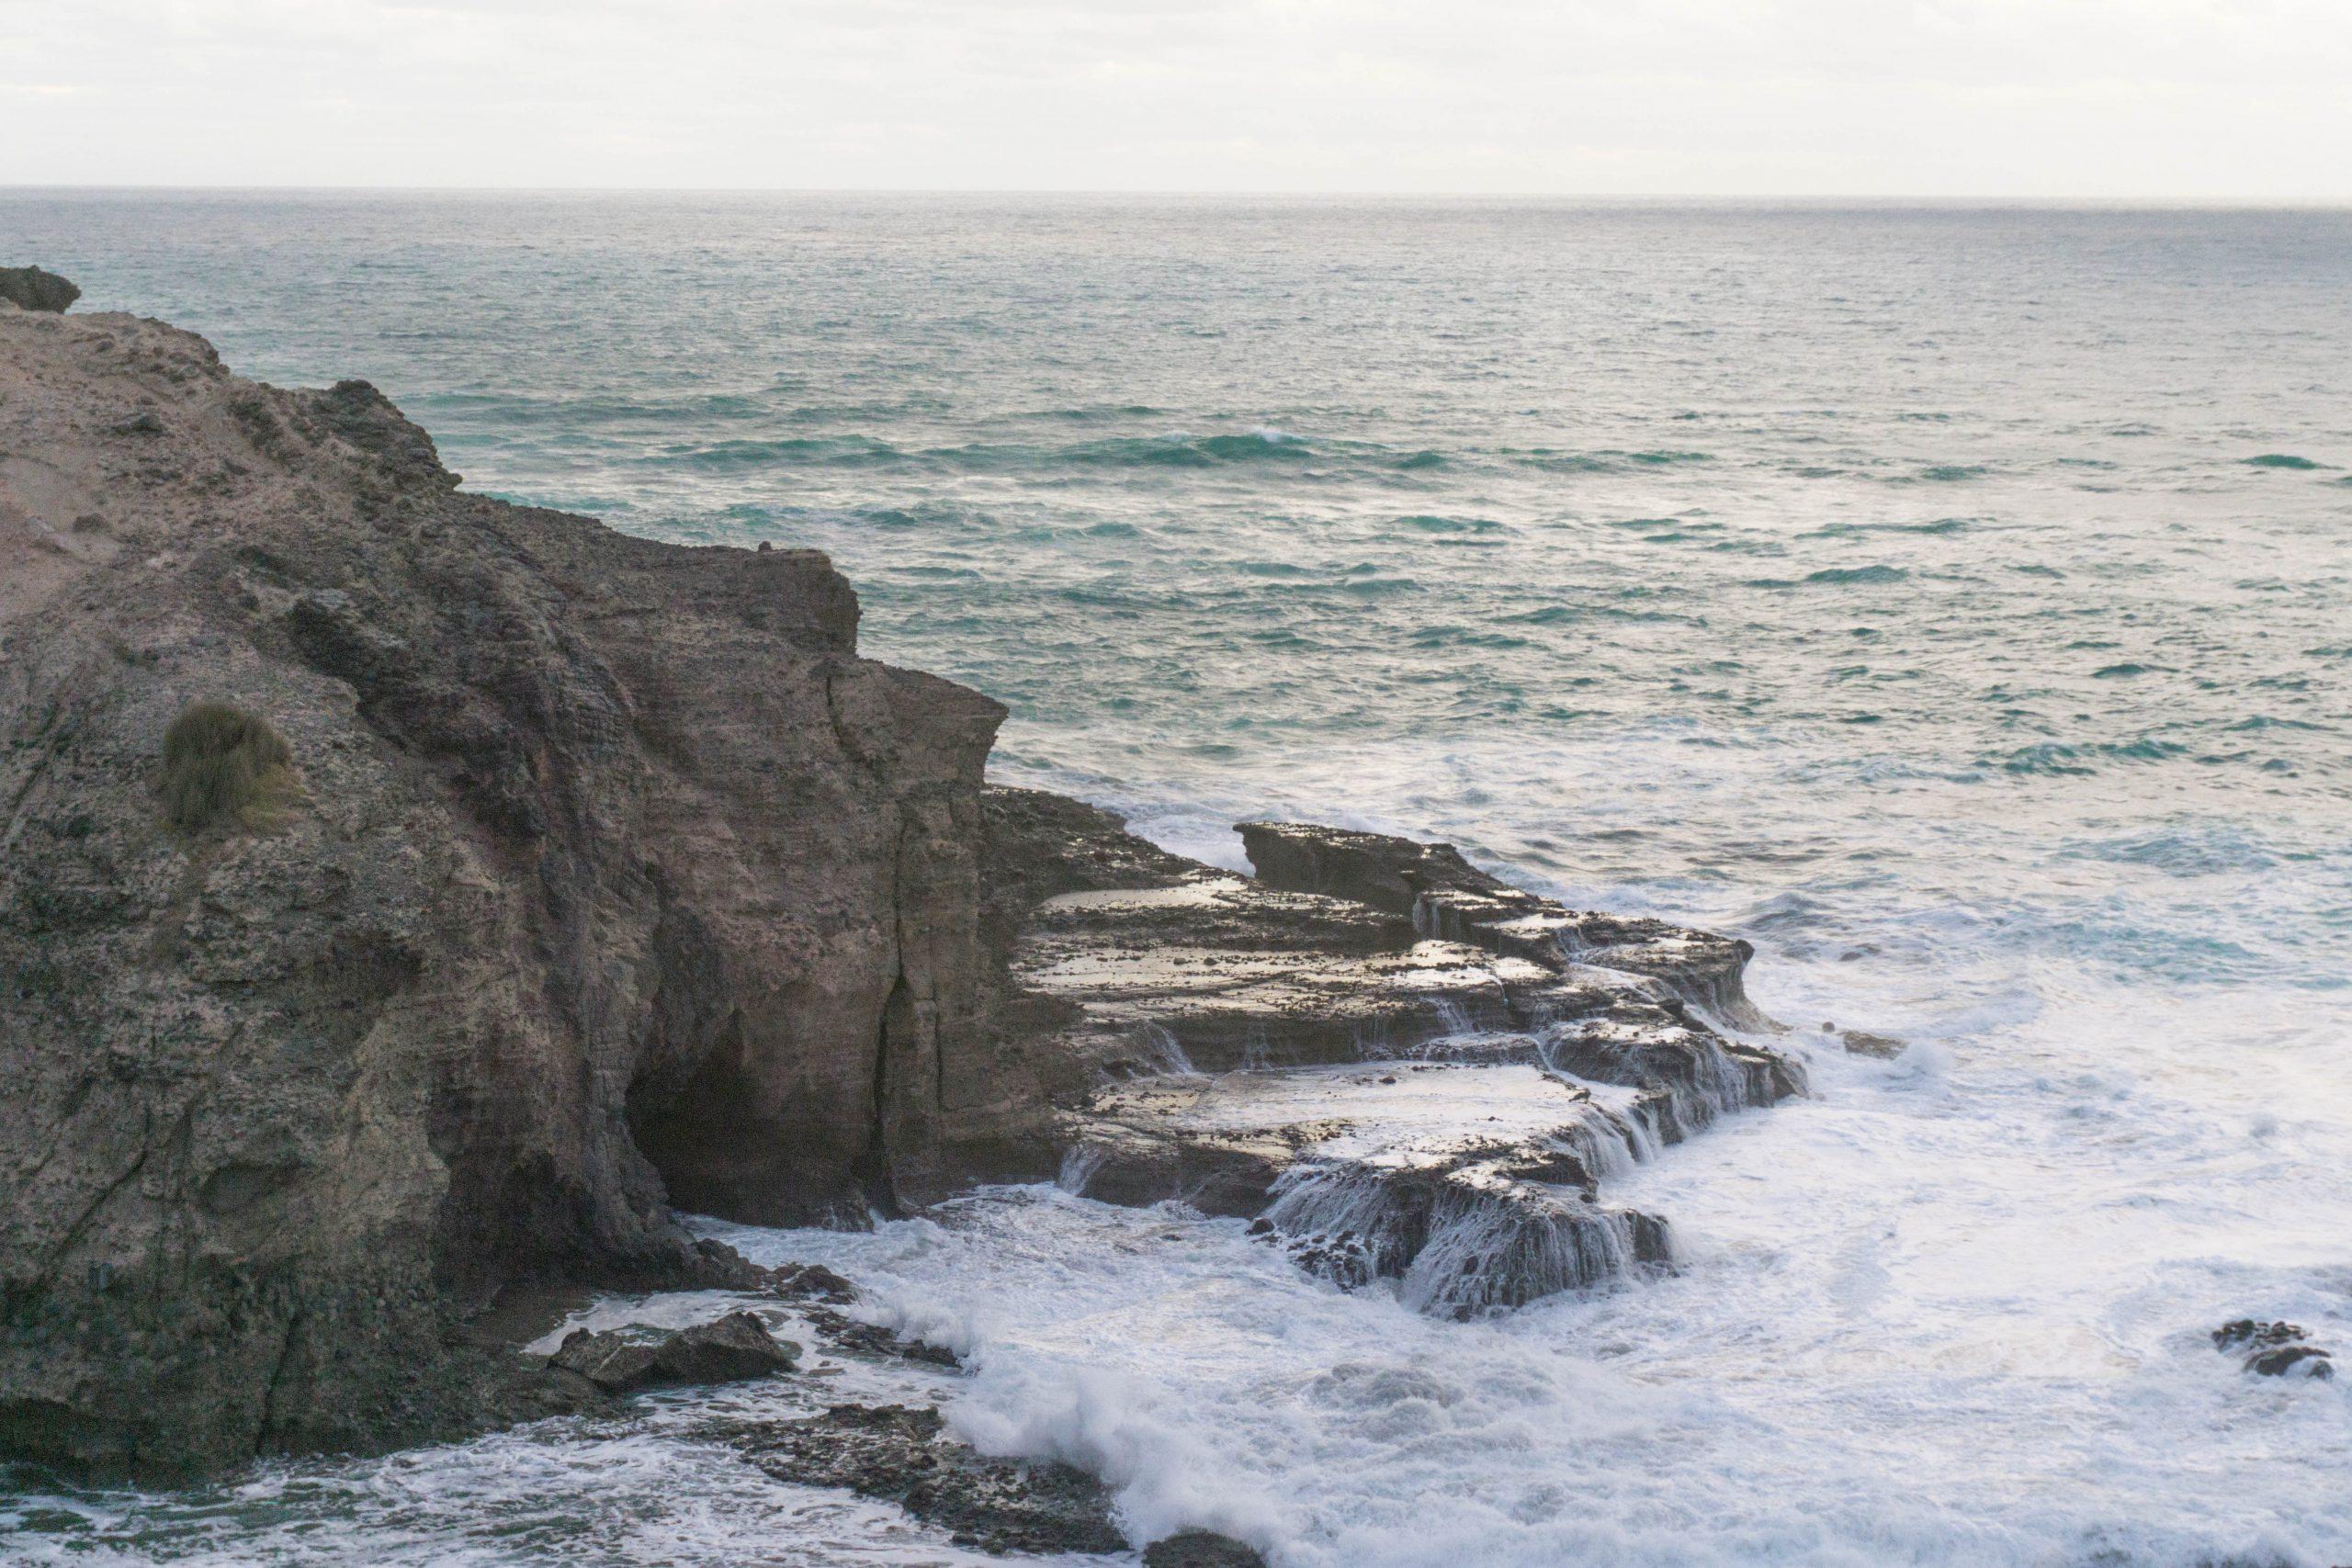 Waves crashing on the rock at Piha beach